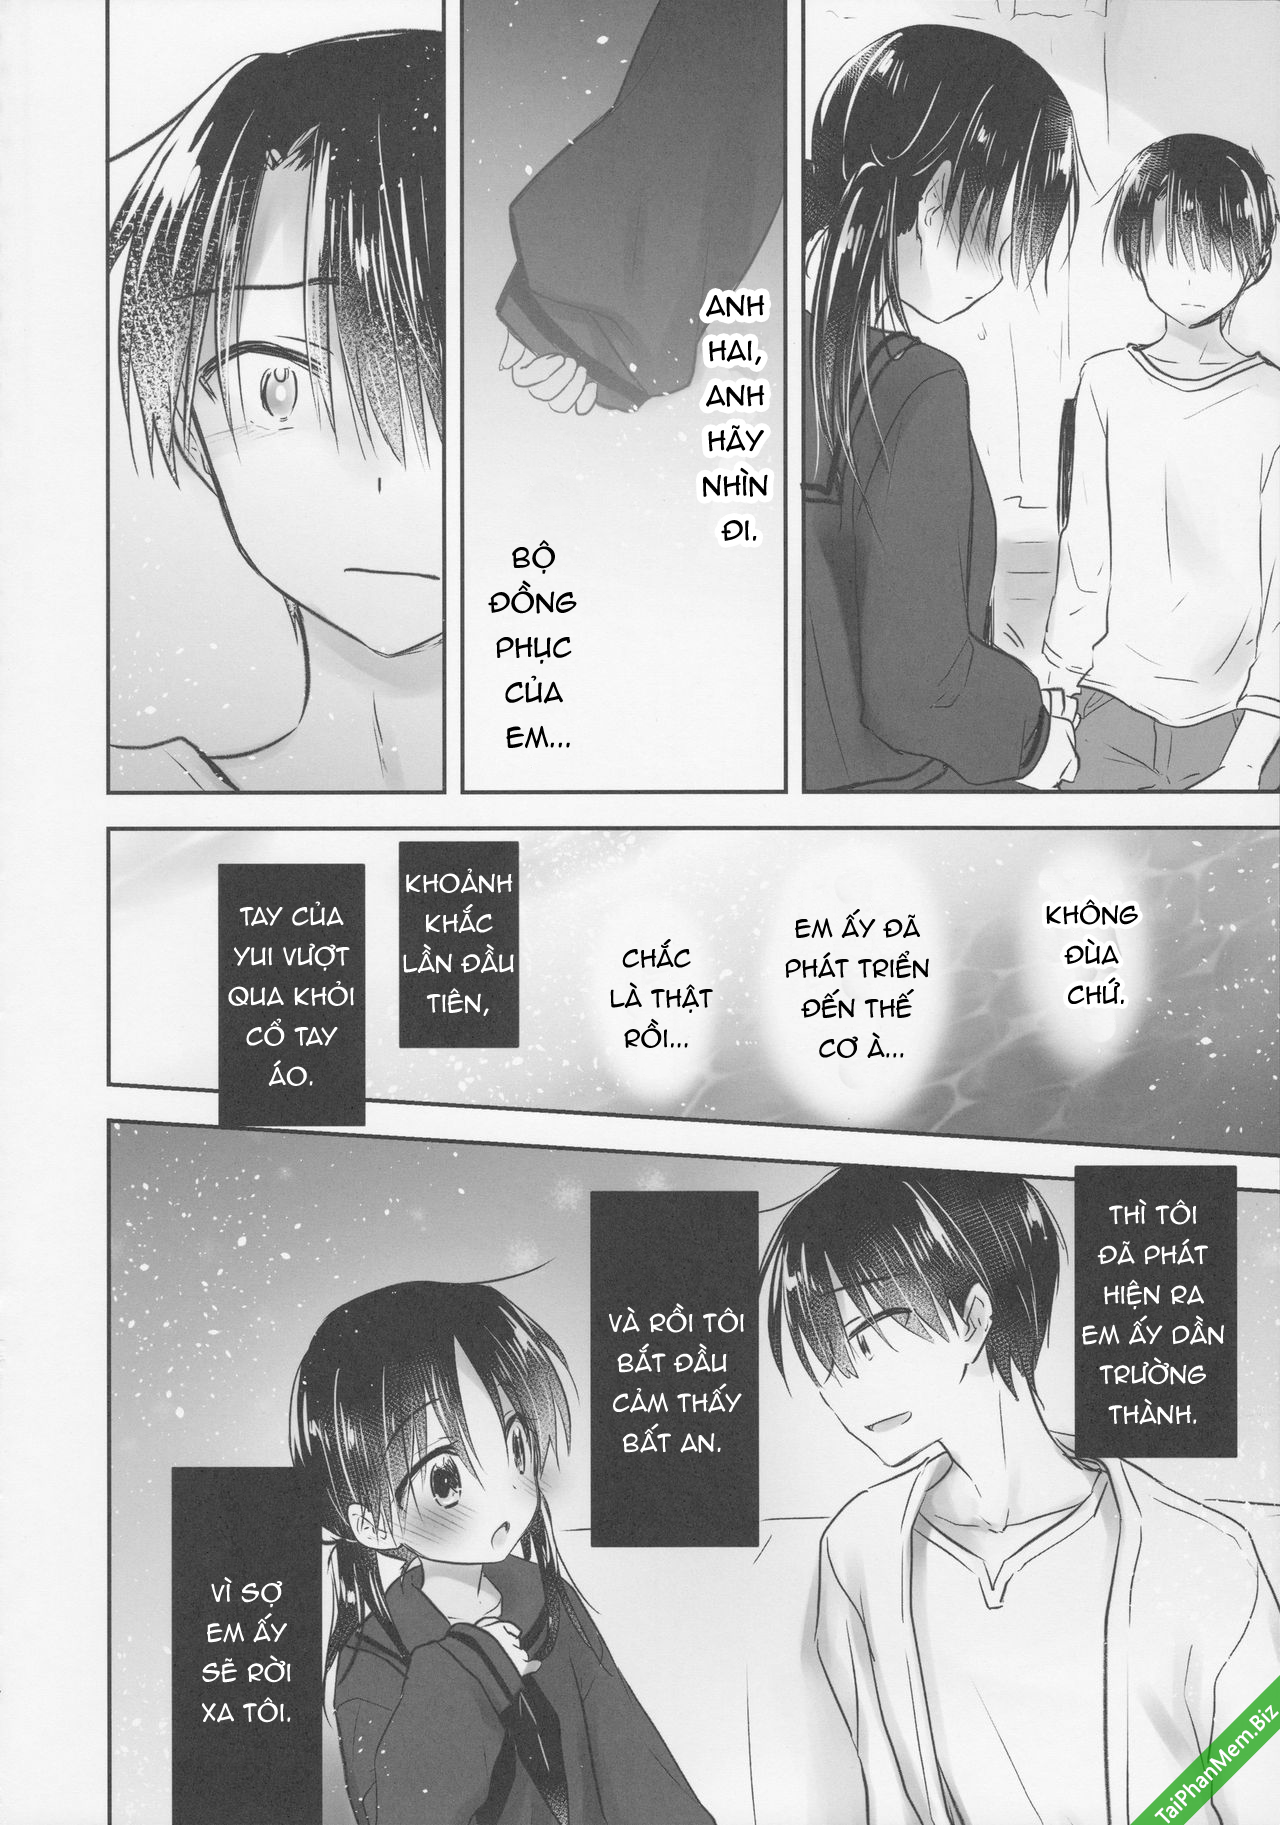 HentaiVN.net - Ảnh 16 - Omocha Sex - Chap 5